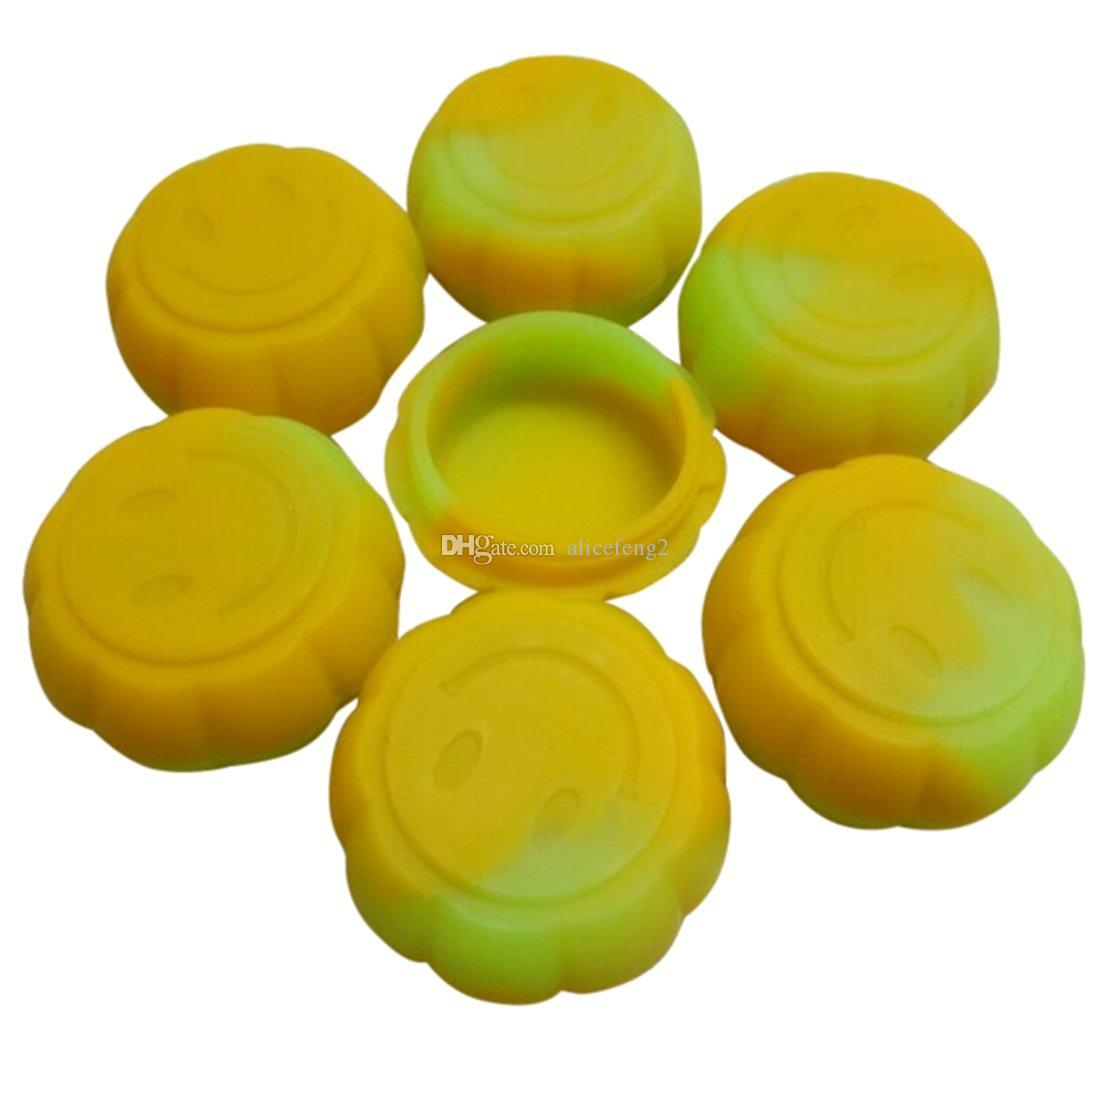 projeto 1000X único abóbora sorridente Wax Container Silicone Jars 5ml reutilizável Silicone Jars Dab Wax Container Silicone Non-stick Container